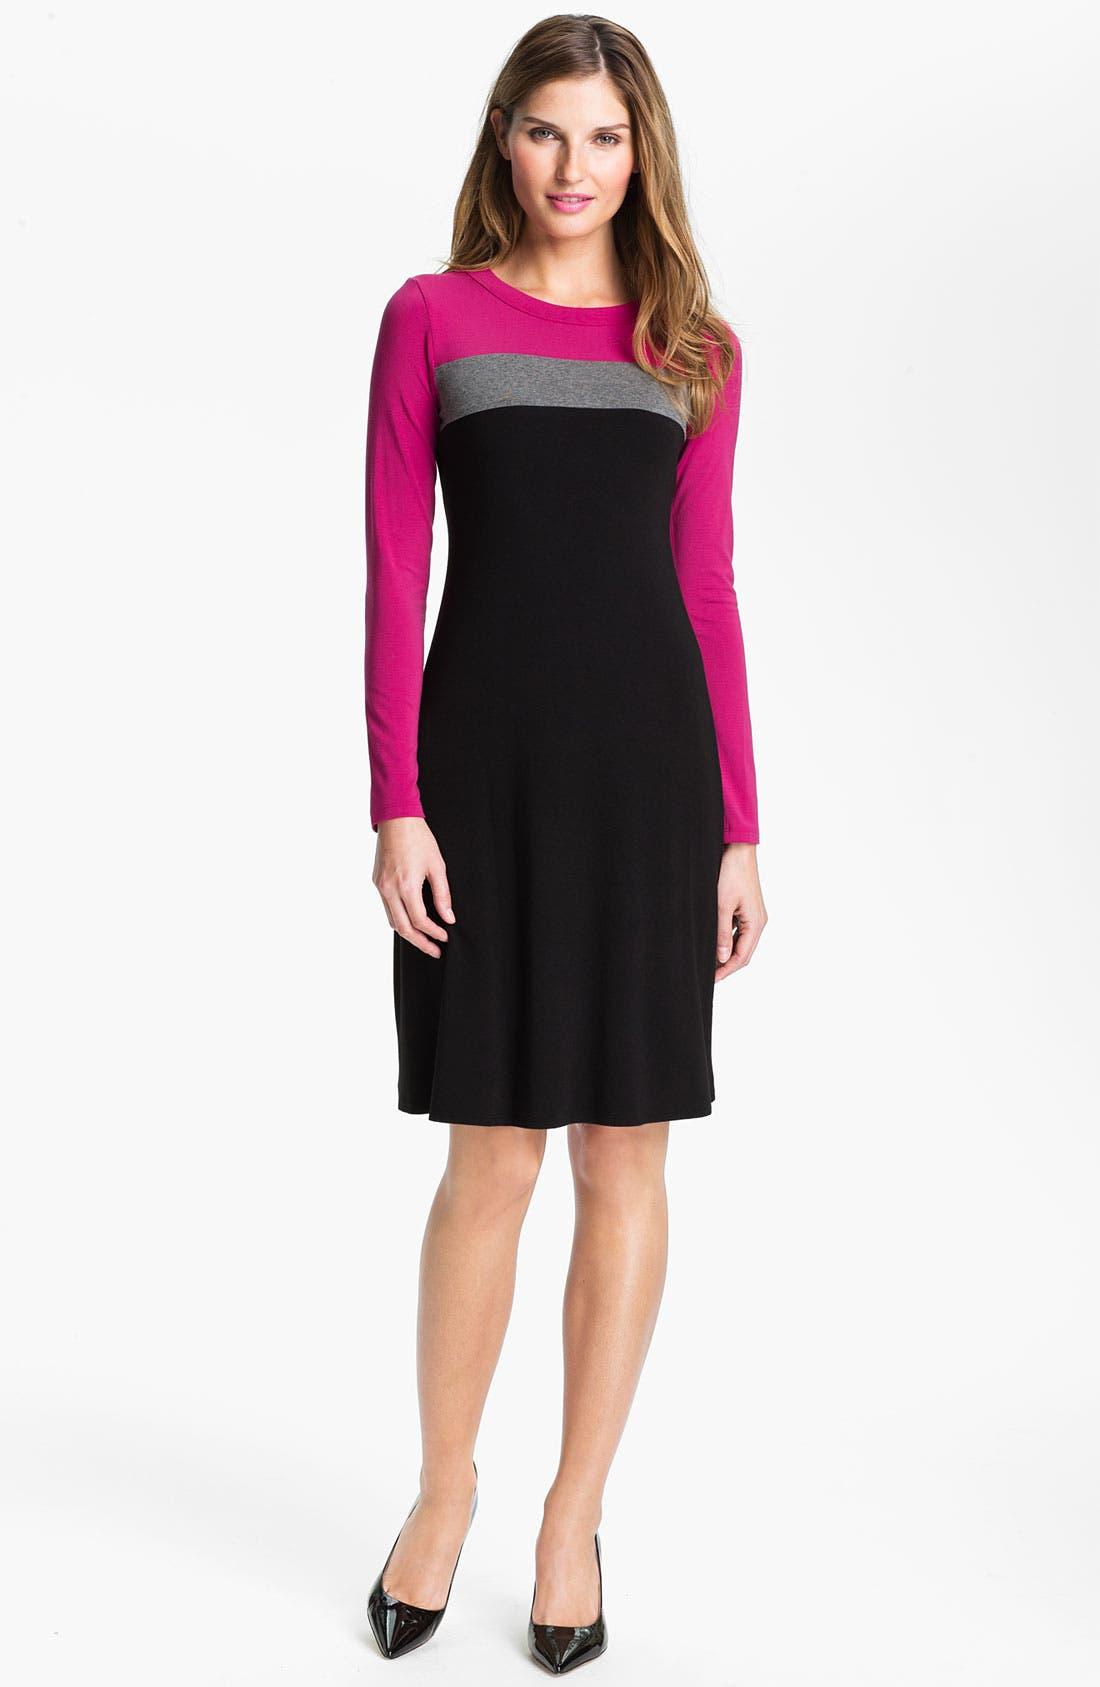 Alternate Image 1 Selected - Karen Kane Colorblock Dress (Online Exclusive)